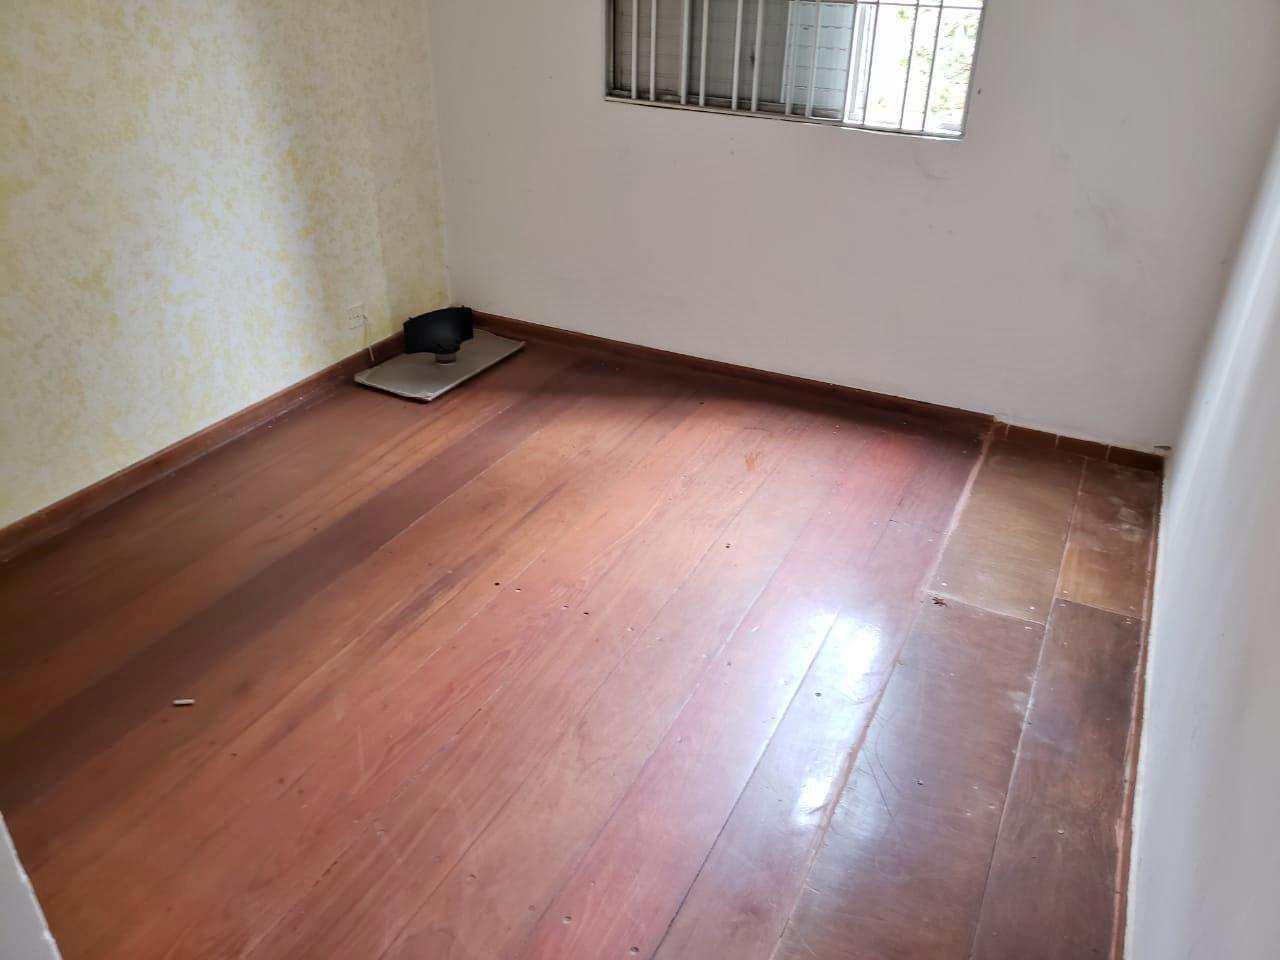 Apartamento com 2 dorms, Cidade Satélite Santa Bárbara, São Paulo - R$ 149 mil, Cod: 11304